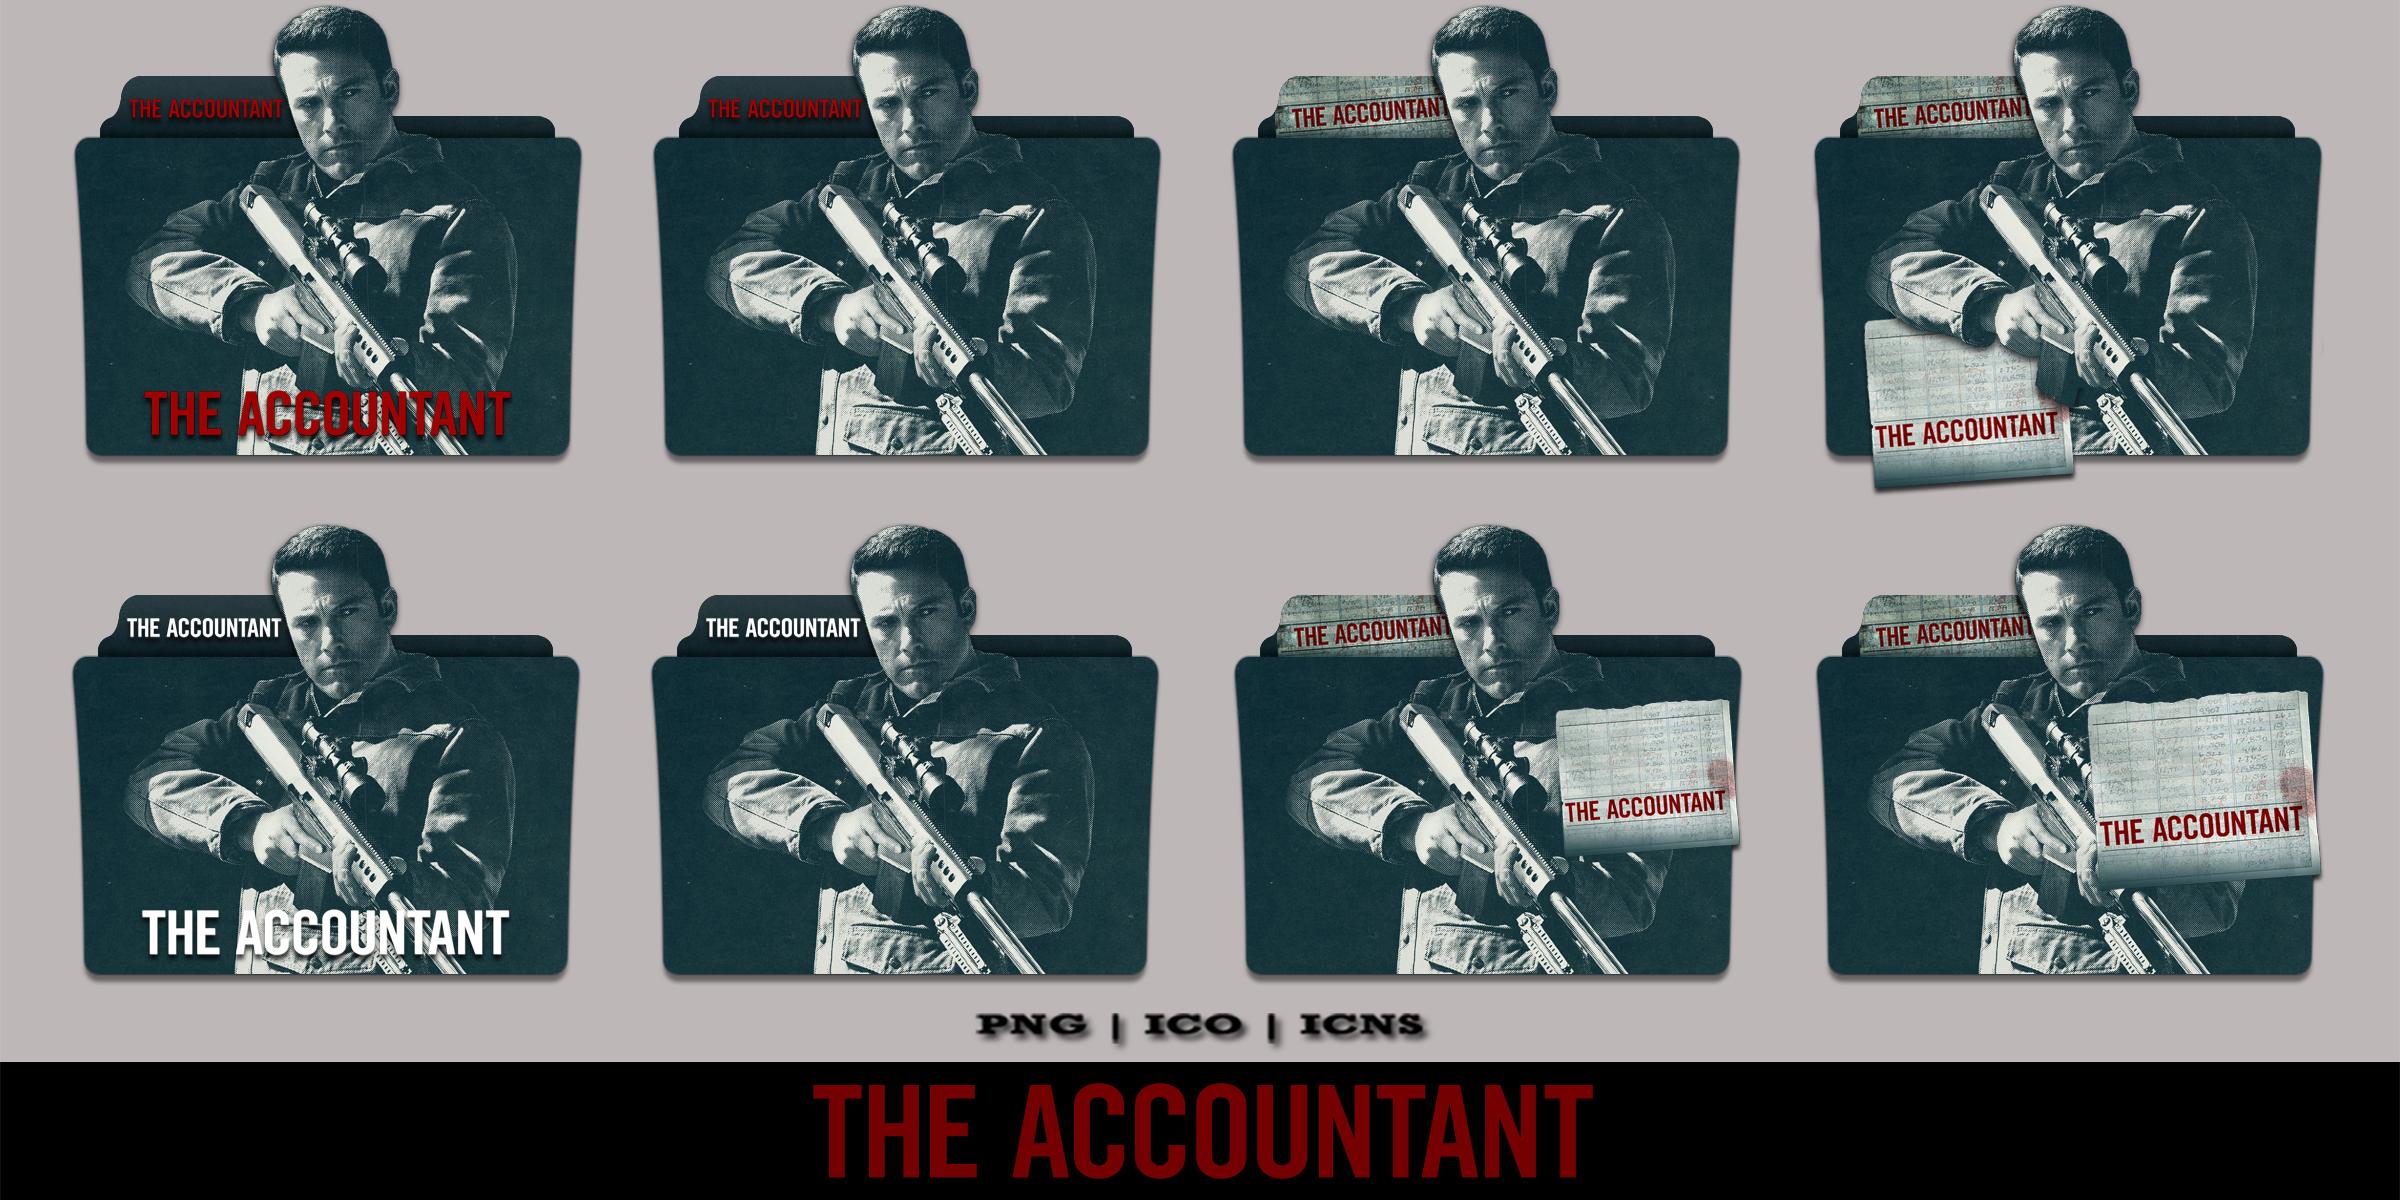 theaccountant | Explore theaccountant on DeviantArt